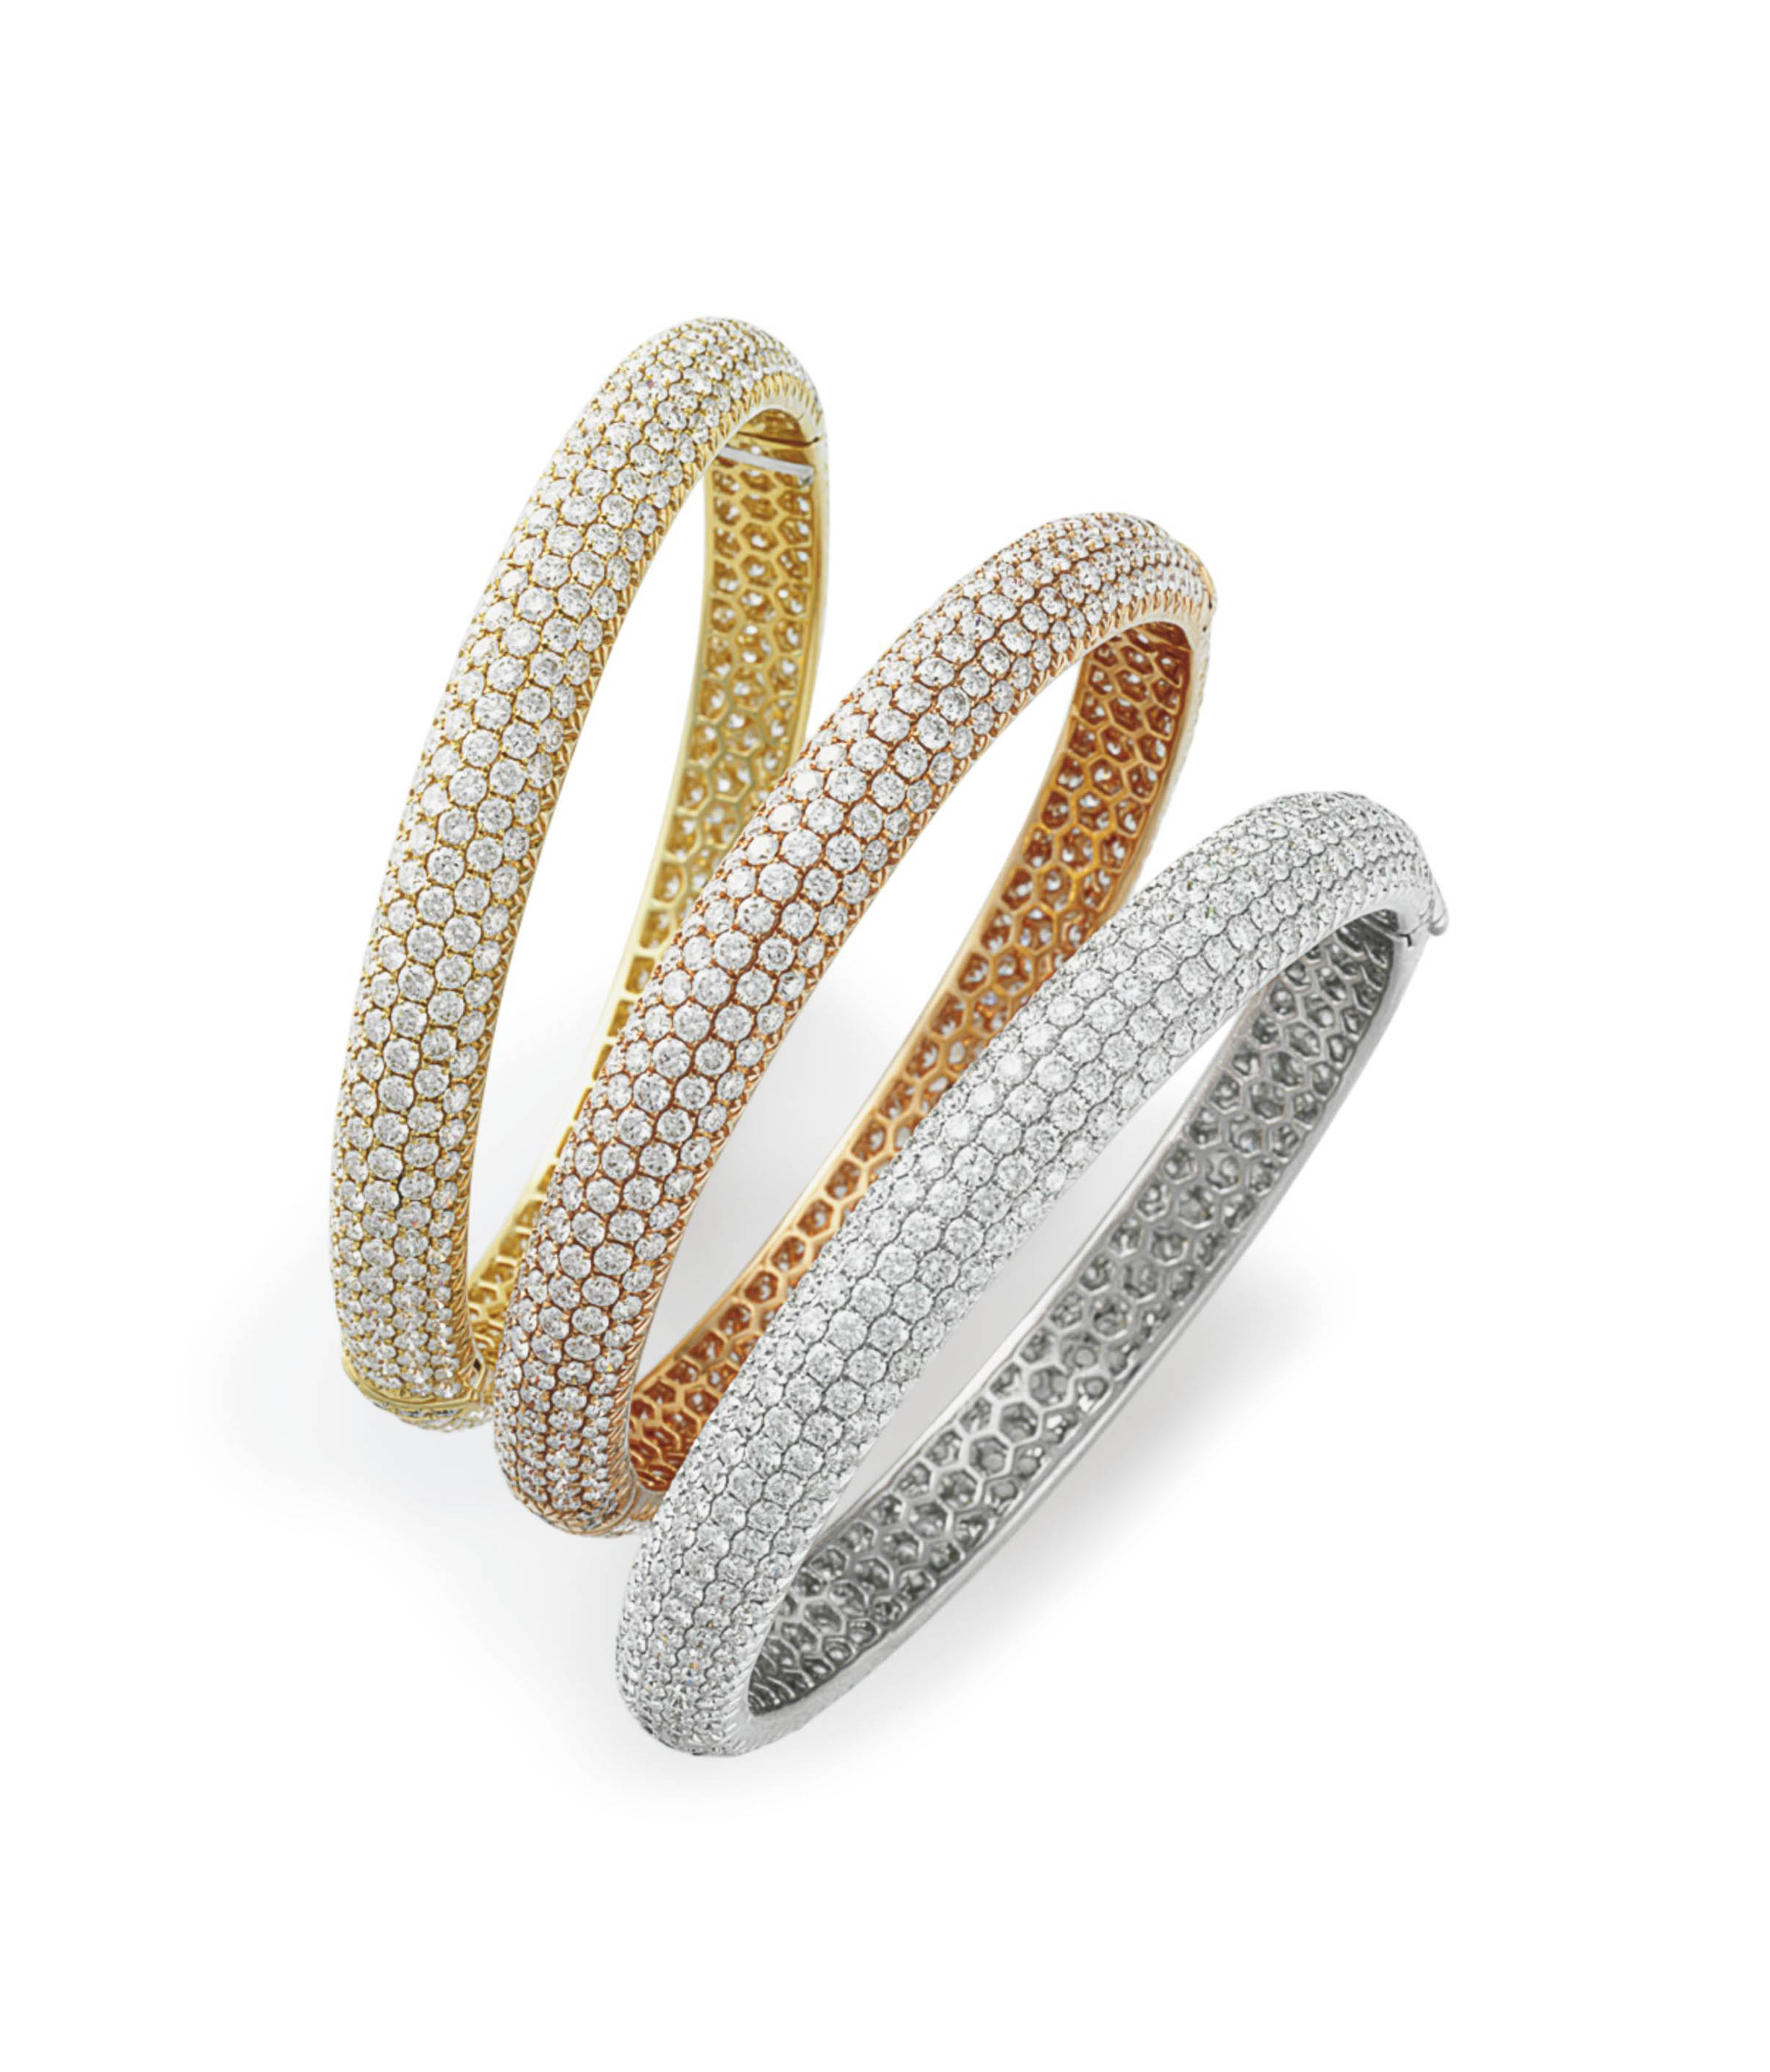 A SET OF THREE DIAMOND AND GOL